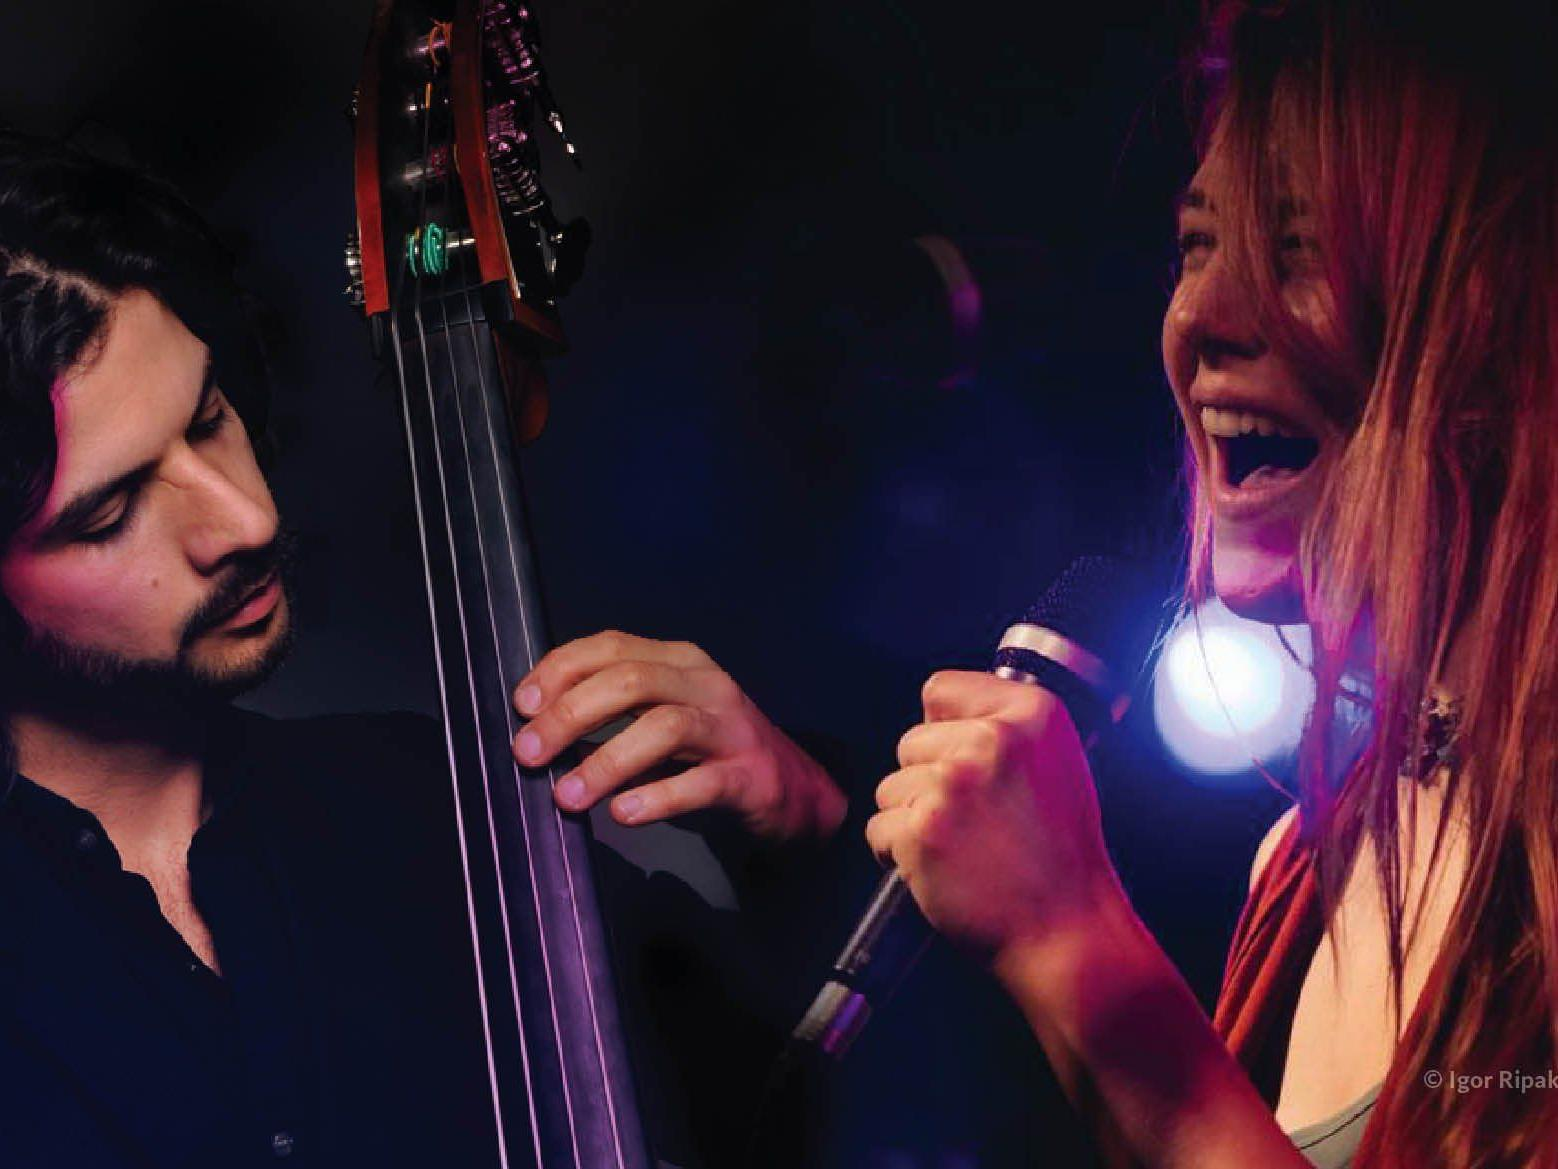 DUO Jessica Slavik und Navid Djawadi